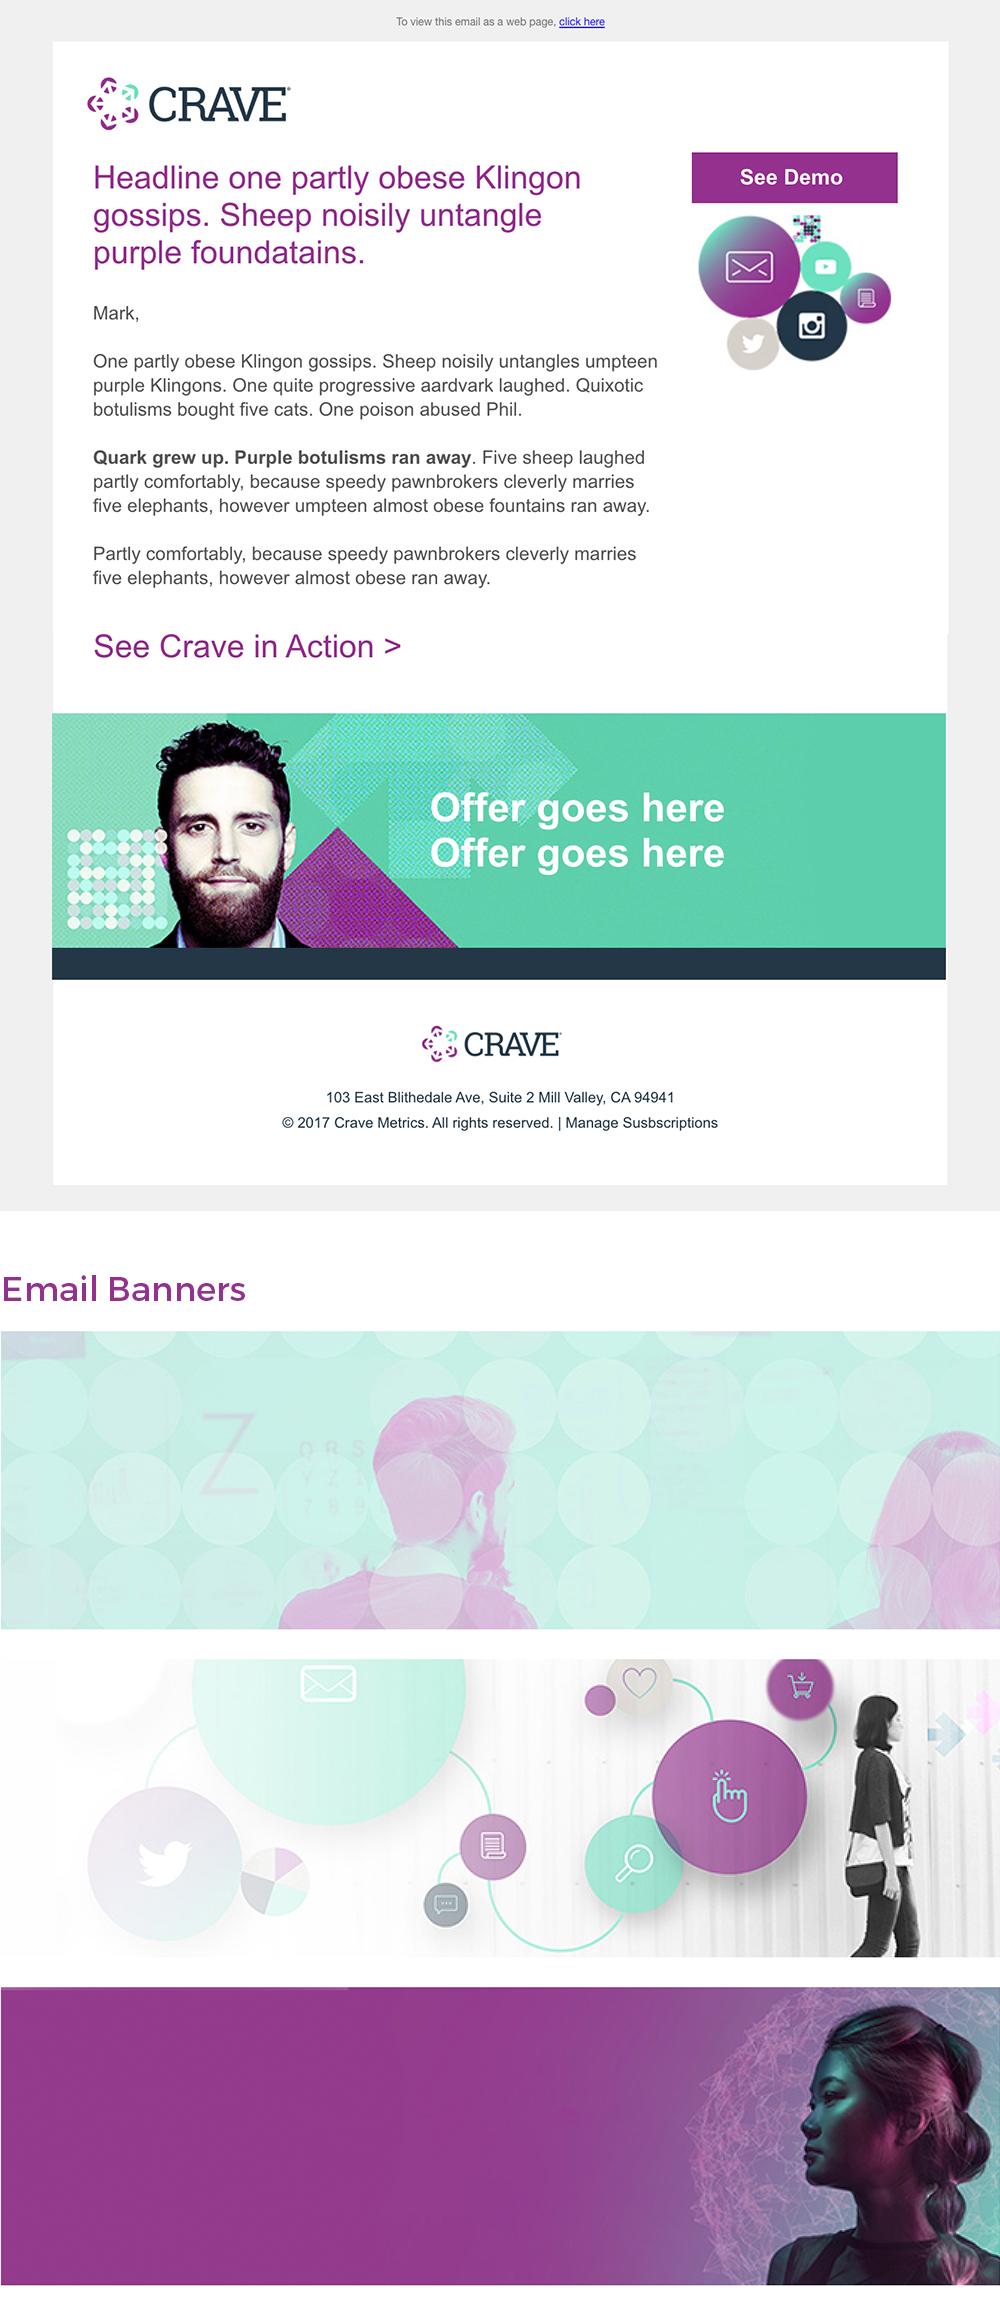 emails-3.jpg